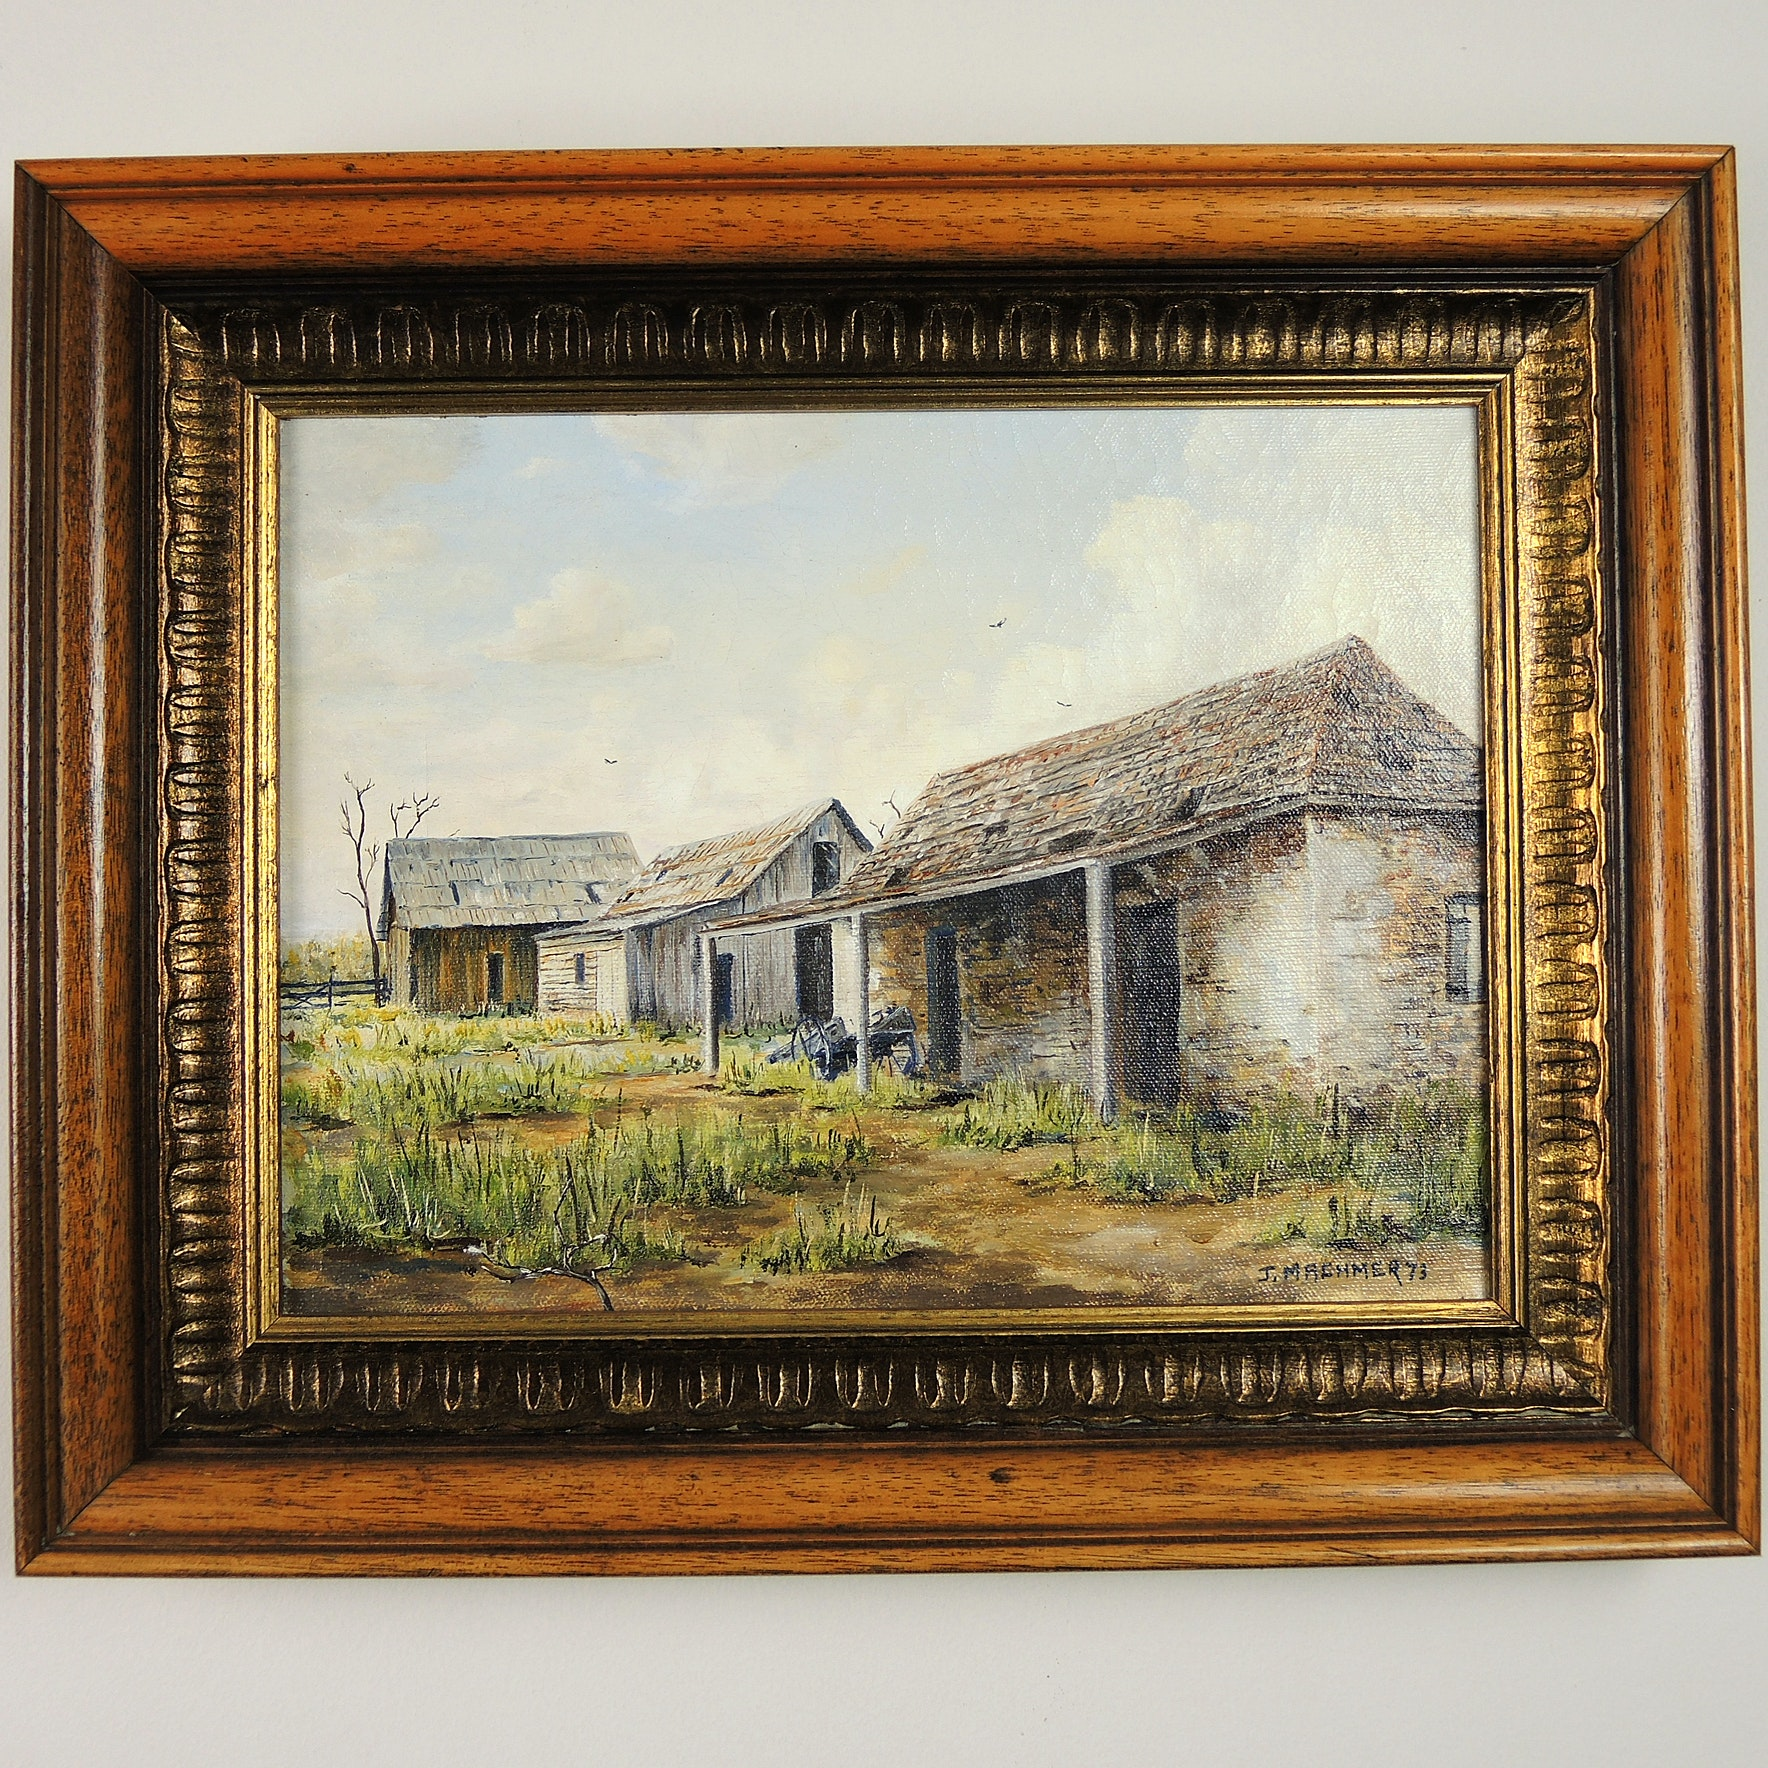 James Machmer Oil Painting of Louisiana Plantation